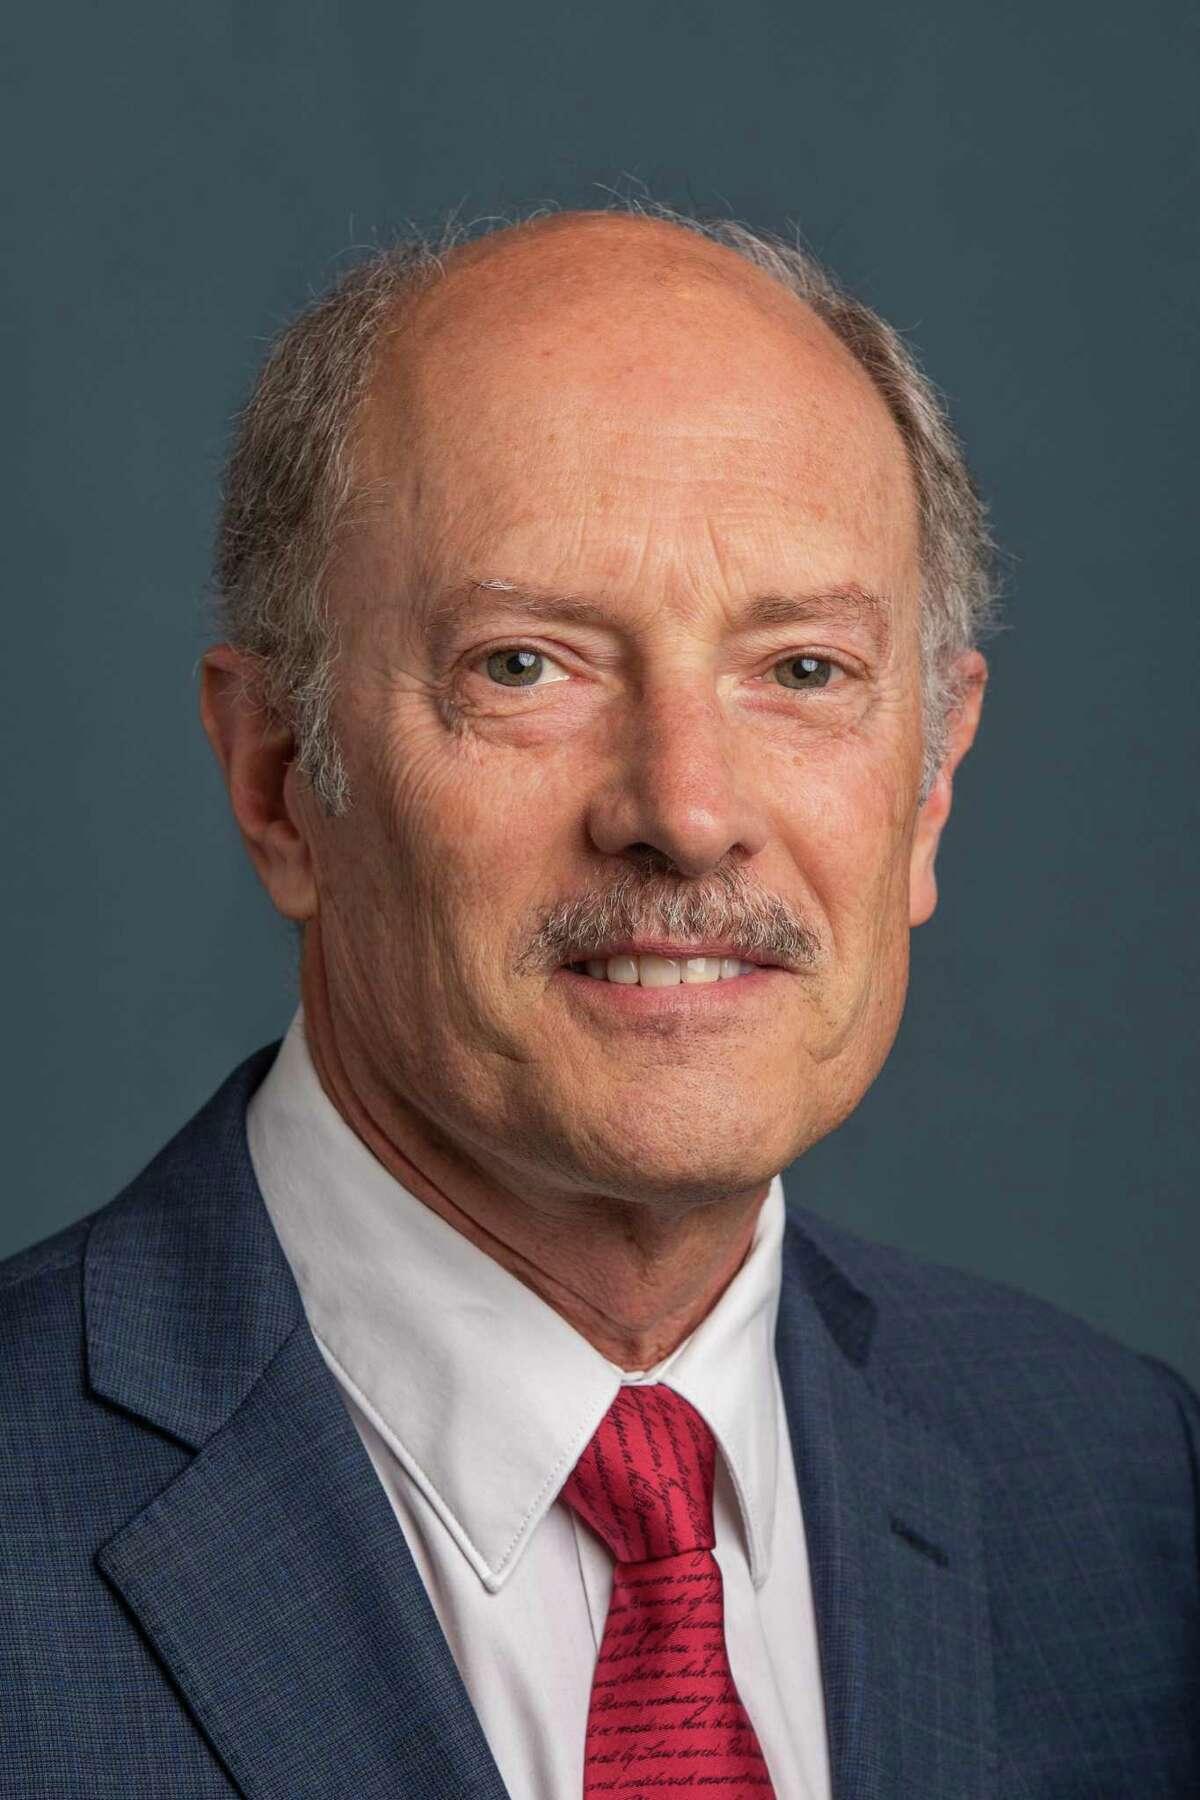 Councilman Carl Massaro